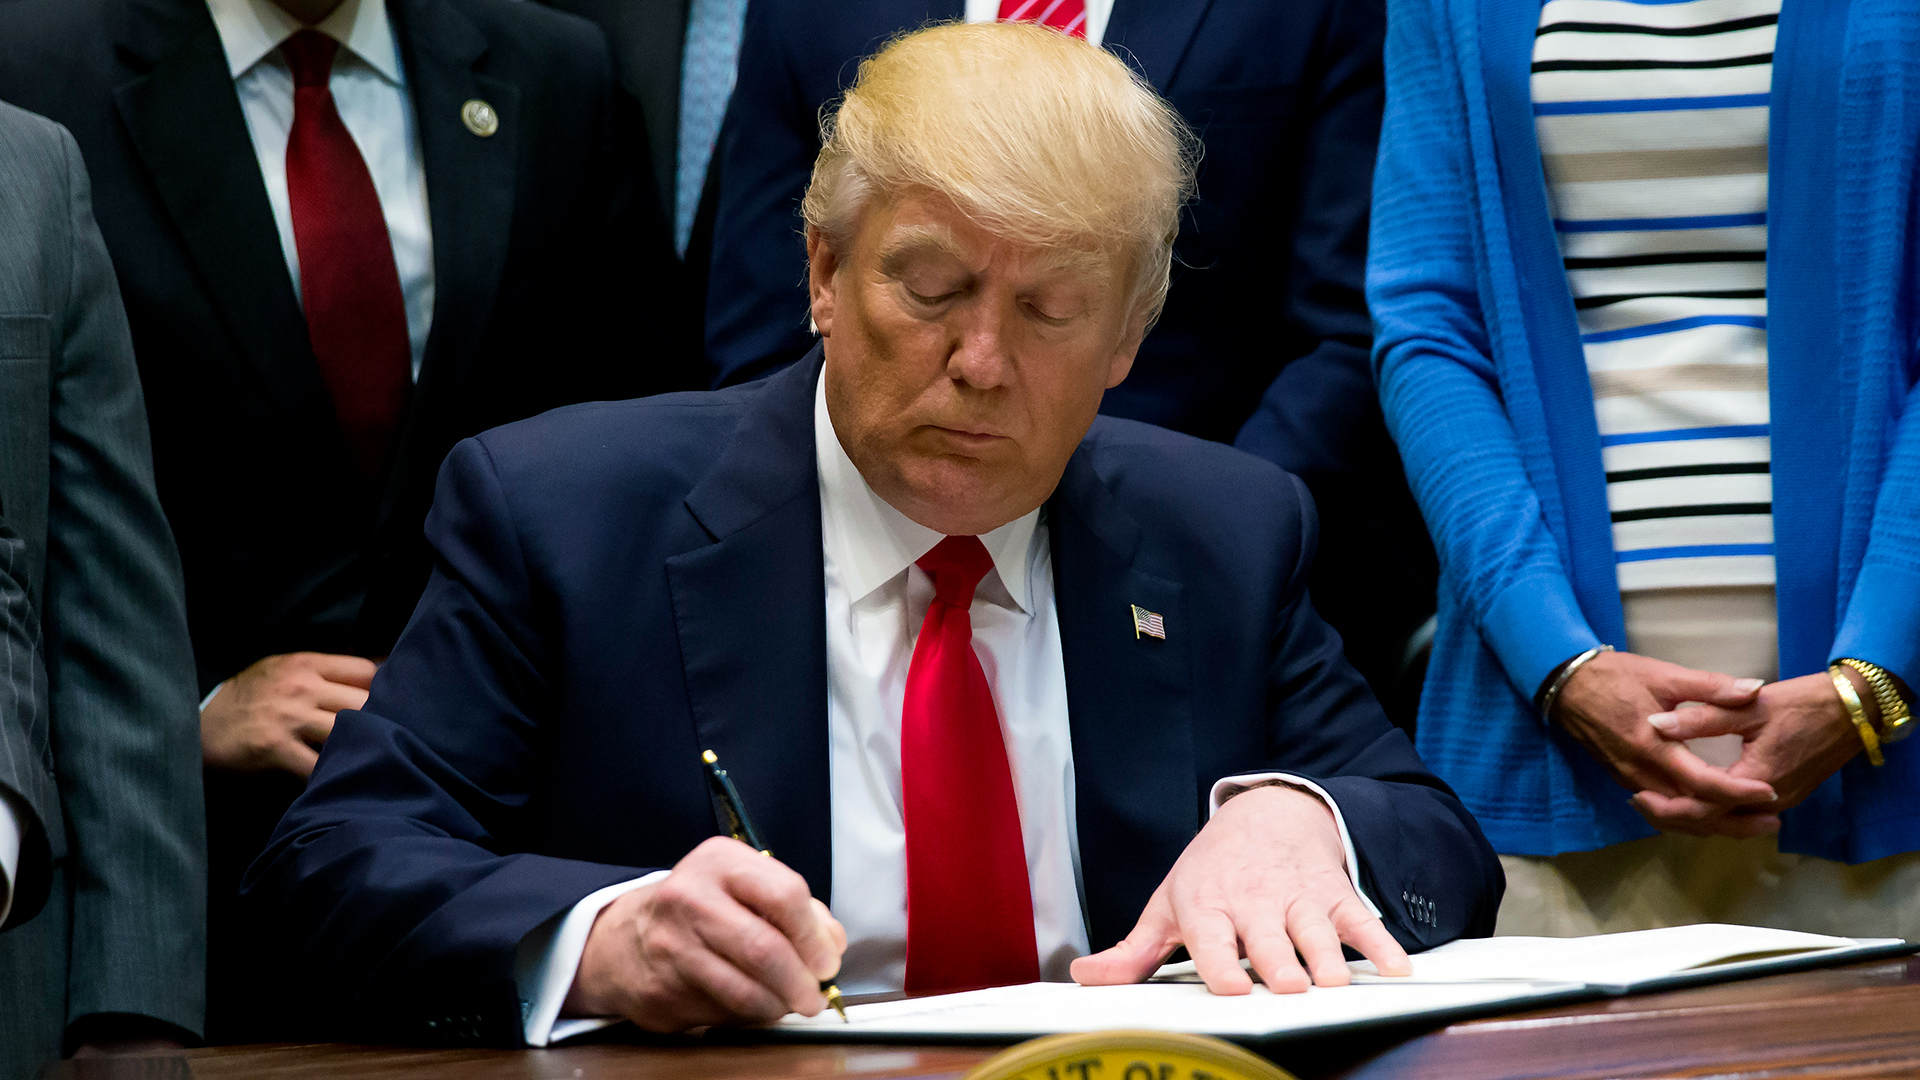 President Trump signing an executive order-159532.jpg84960344